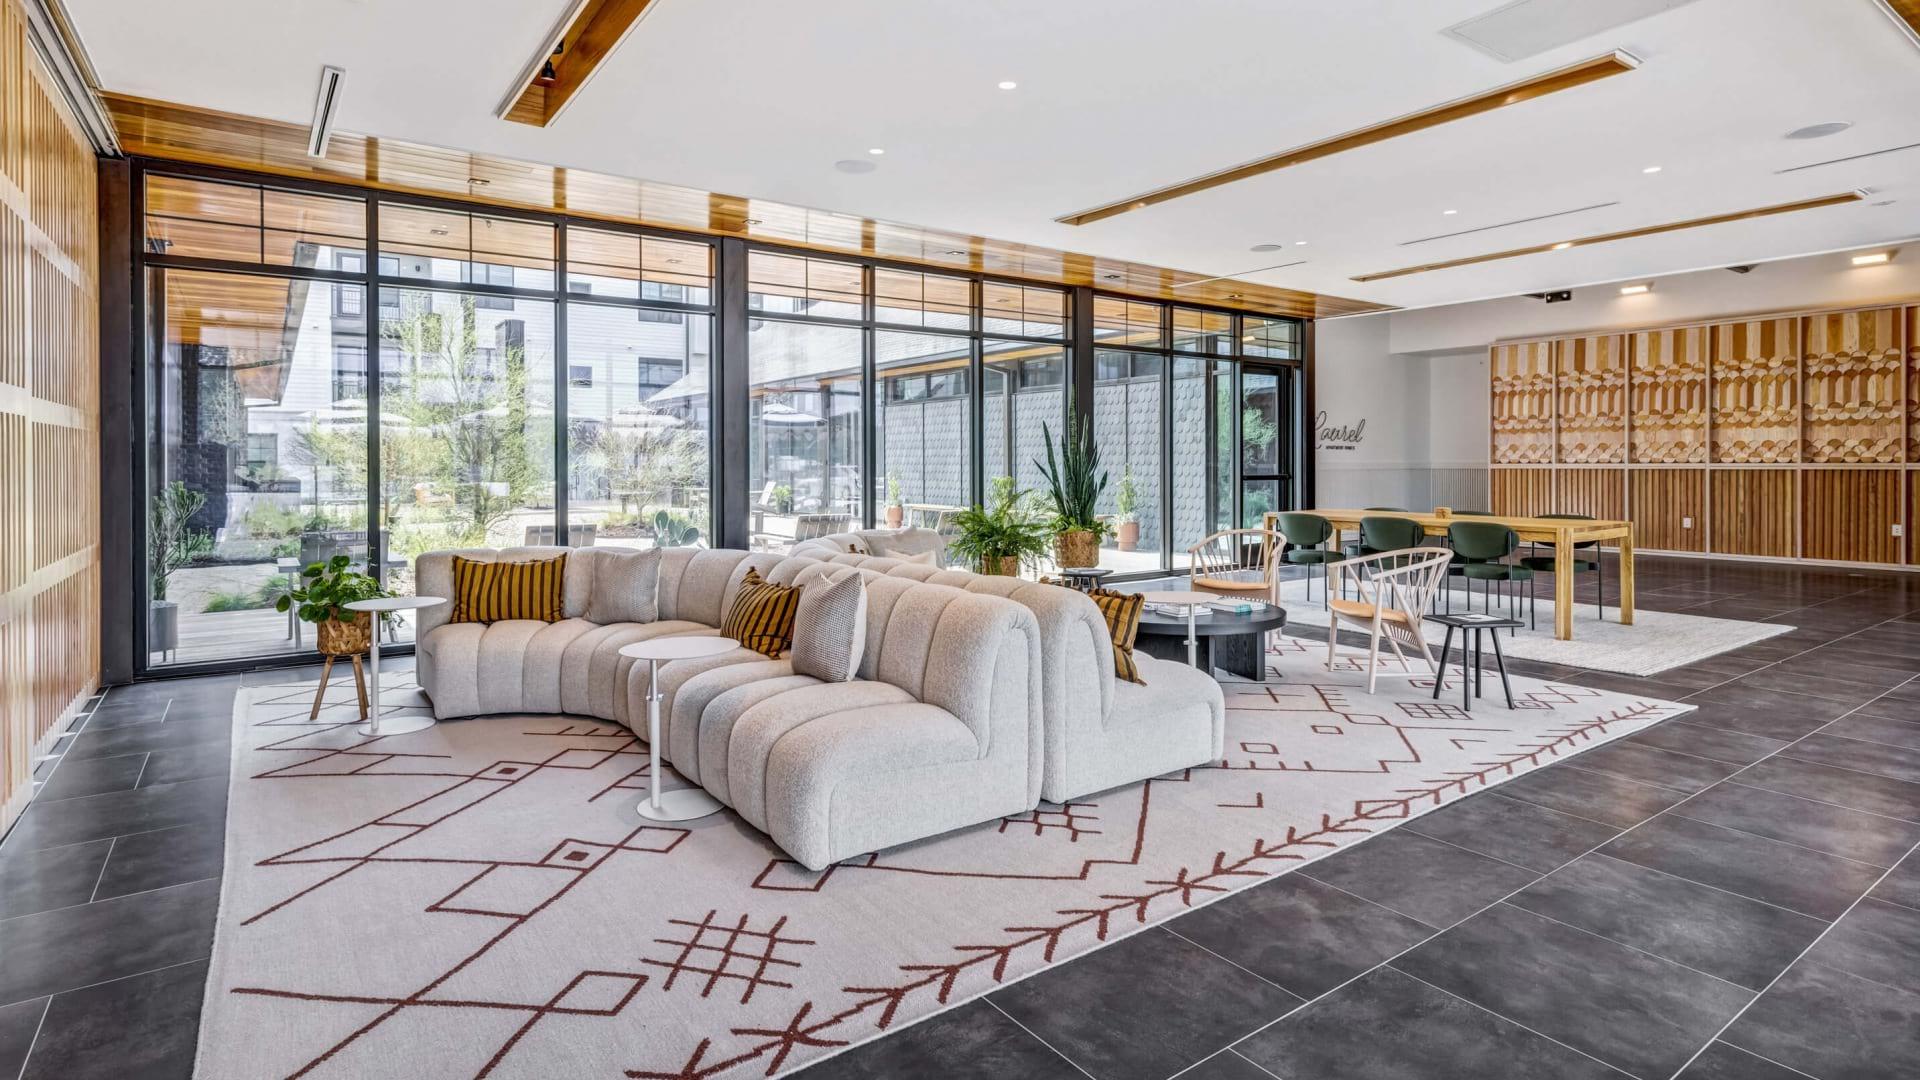 Beautiful clubroom with lounge seating